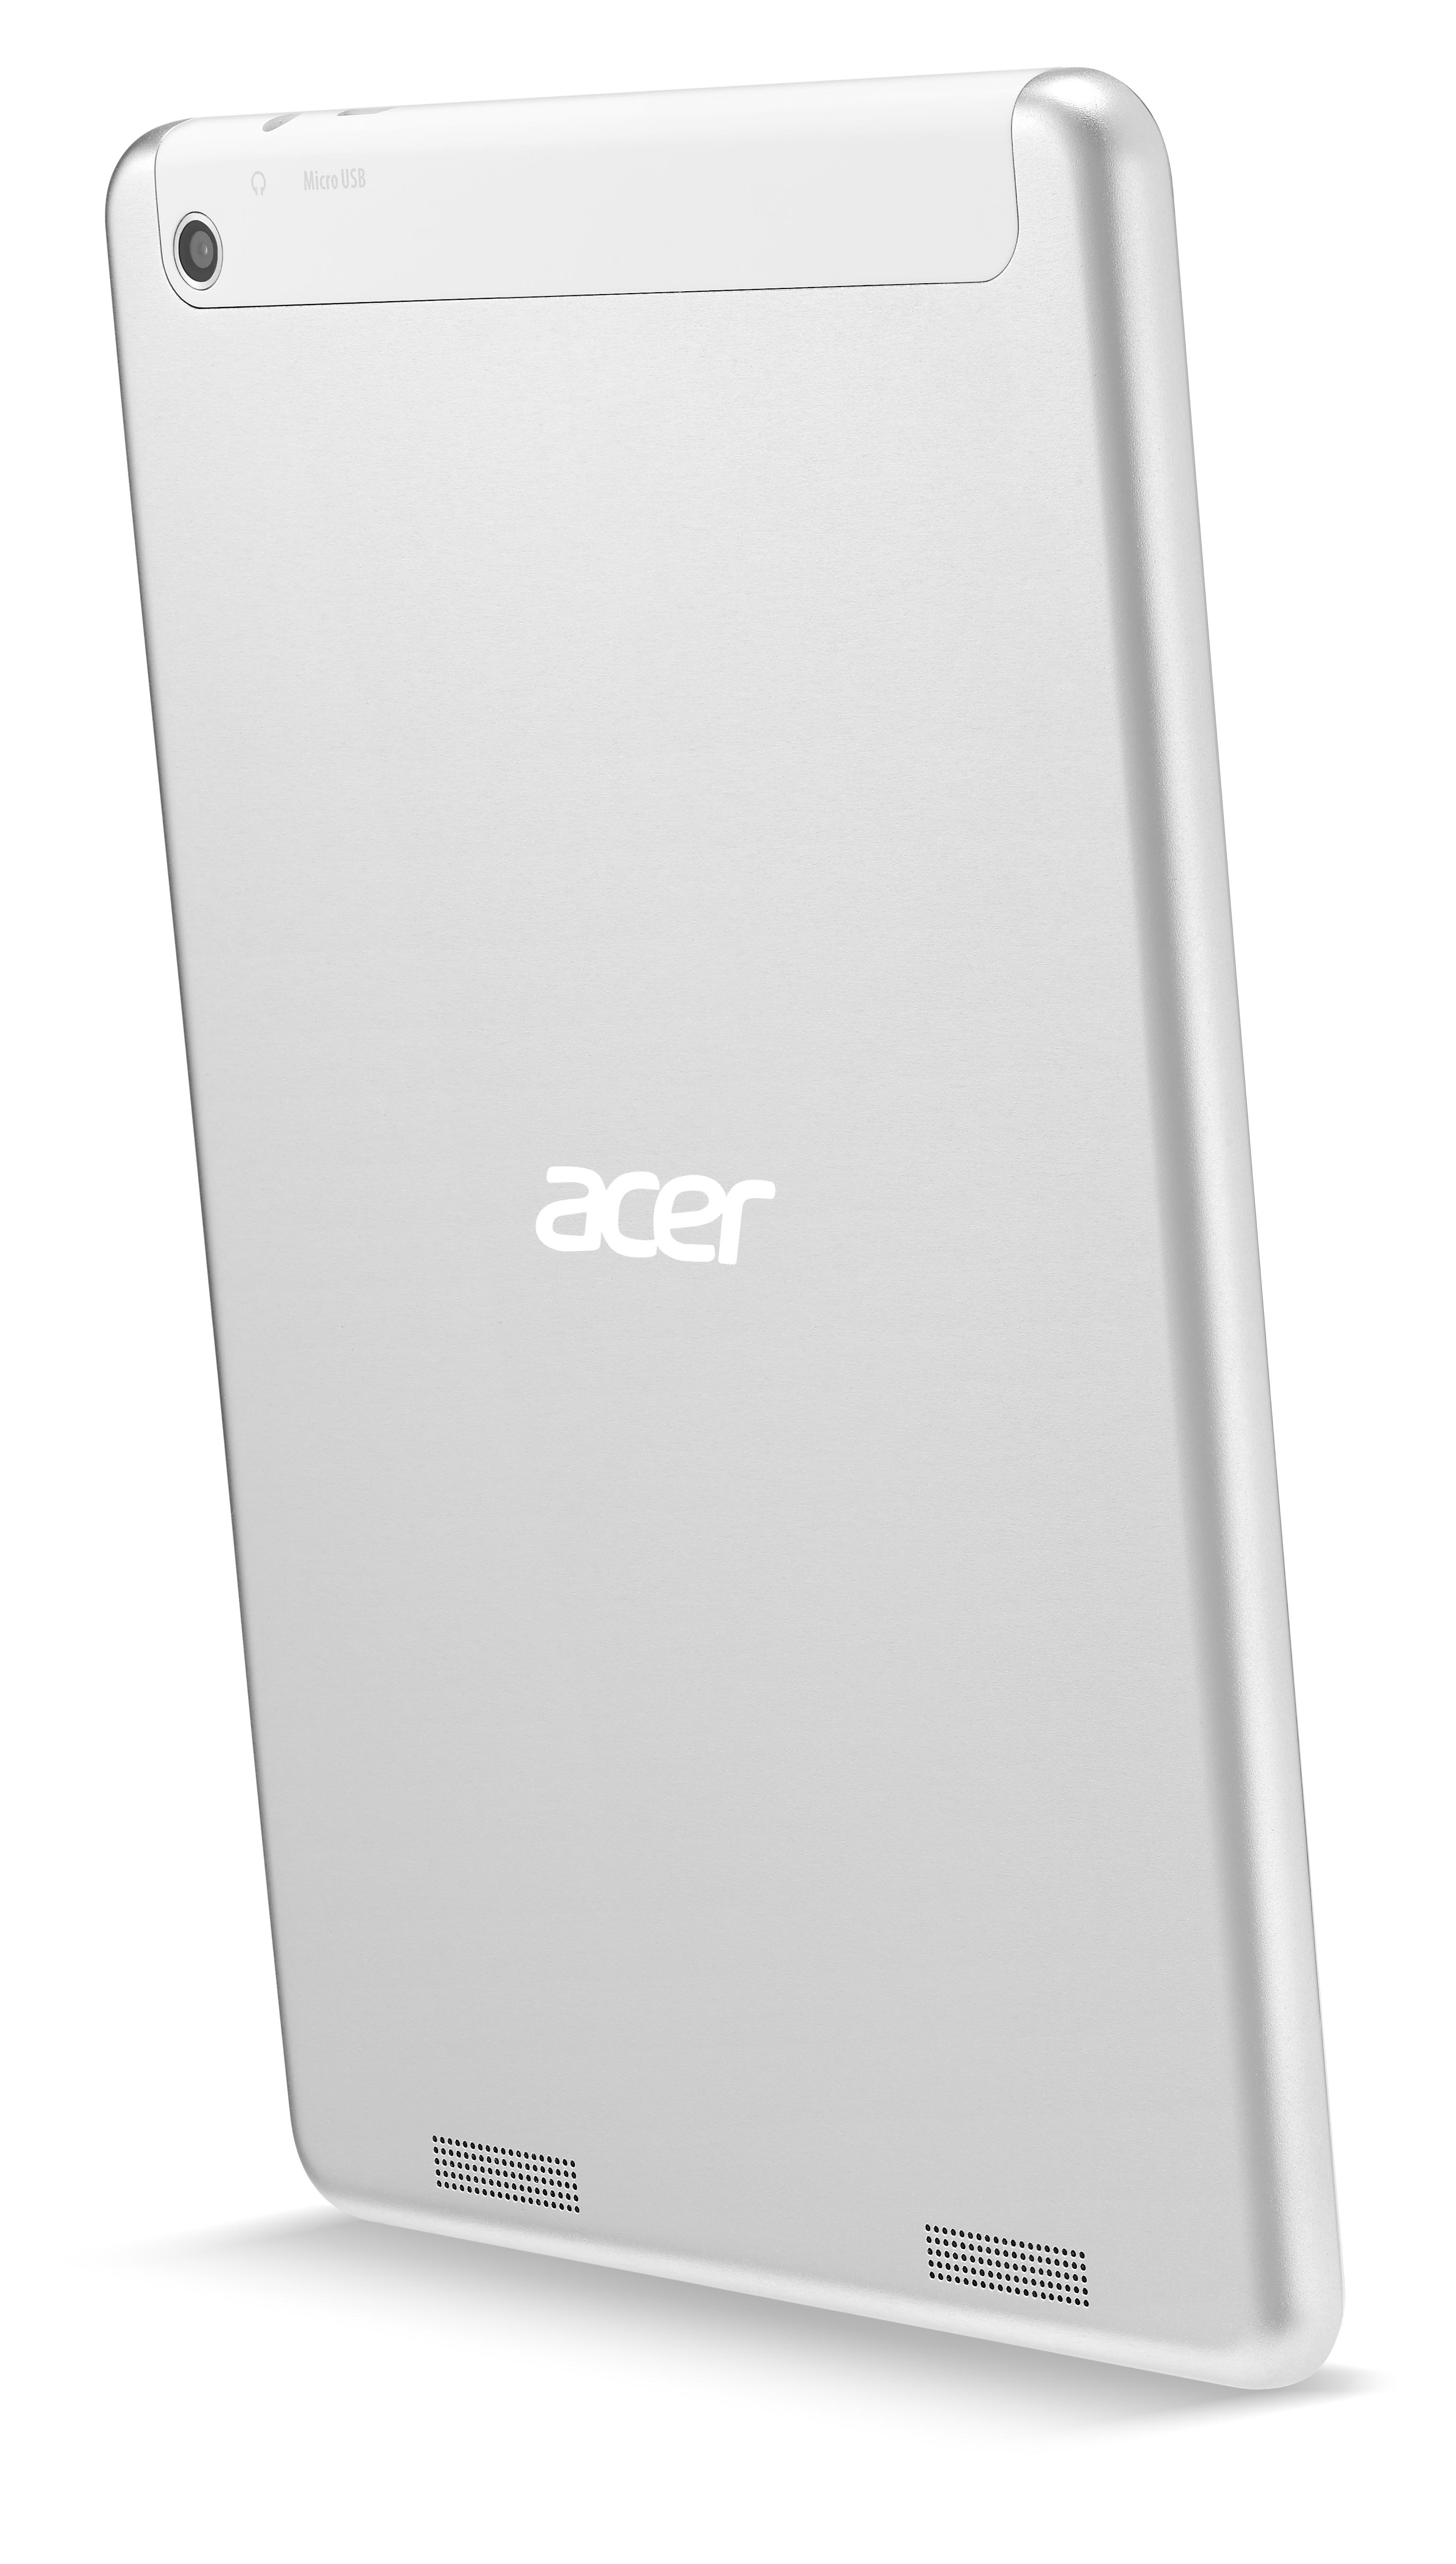 Acer Iconia A1-830 rear angle